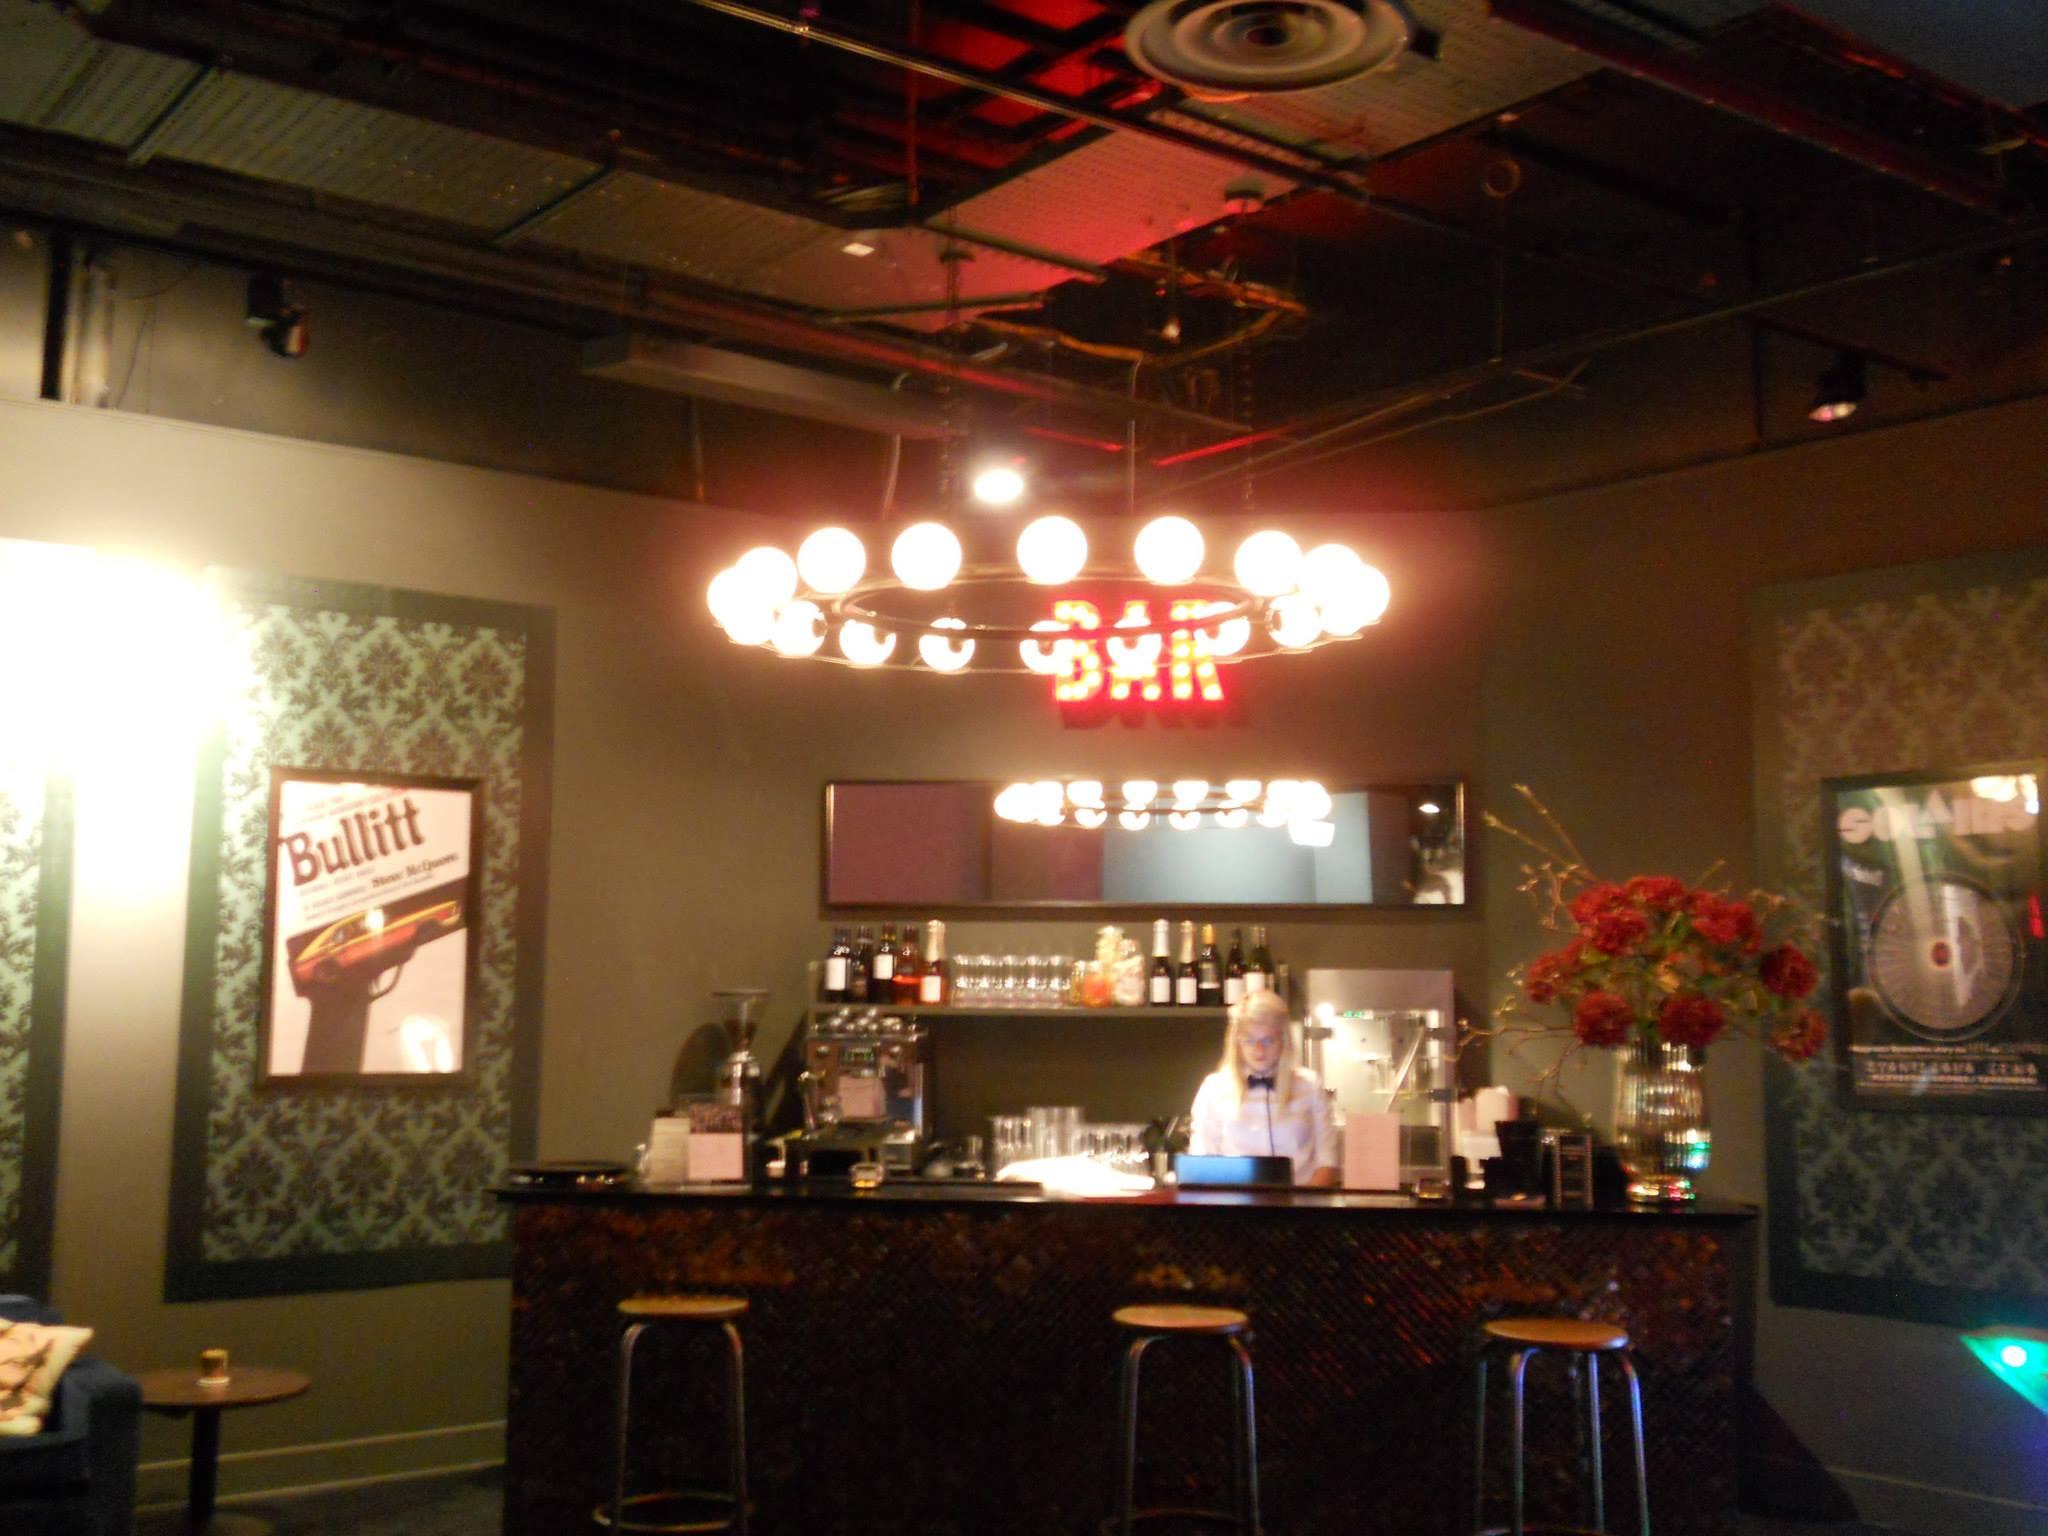 selfridges-everyman-cinema-bar-none